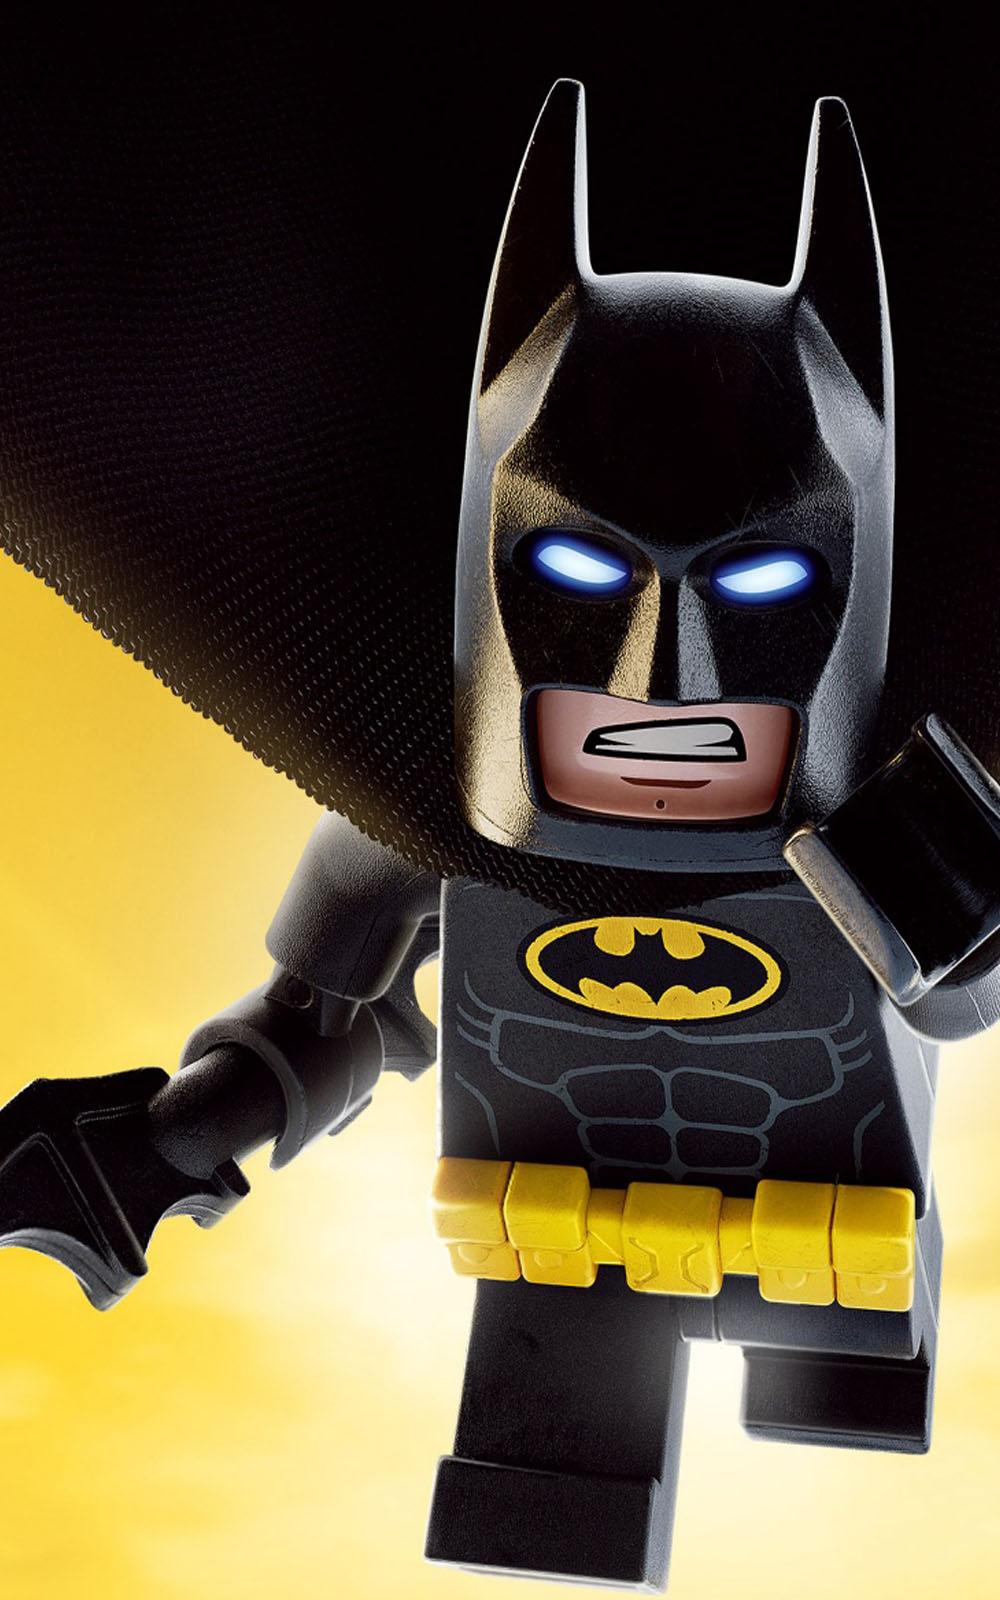 the lego batman download free hd mobile wallpapers. Black Bedroom Furniture Sets. Home Design Ideas